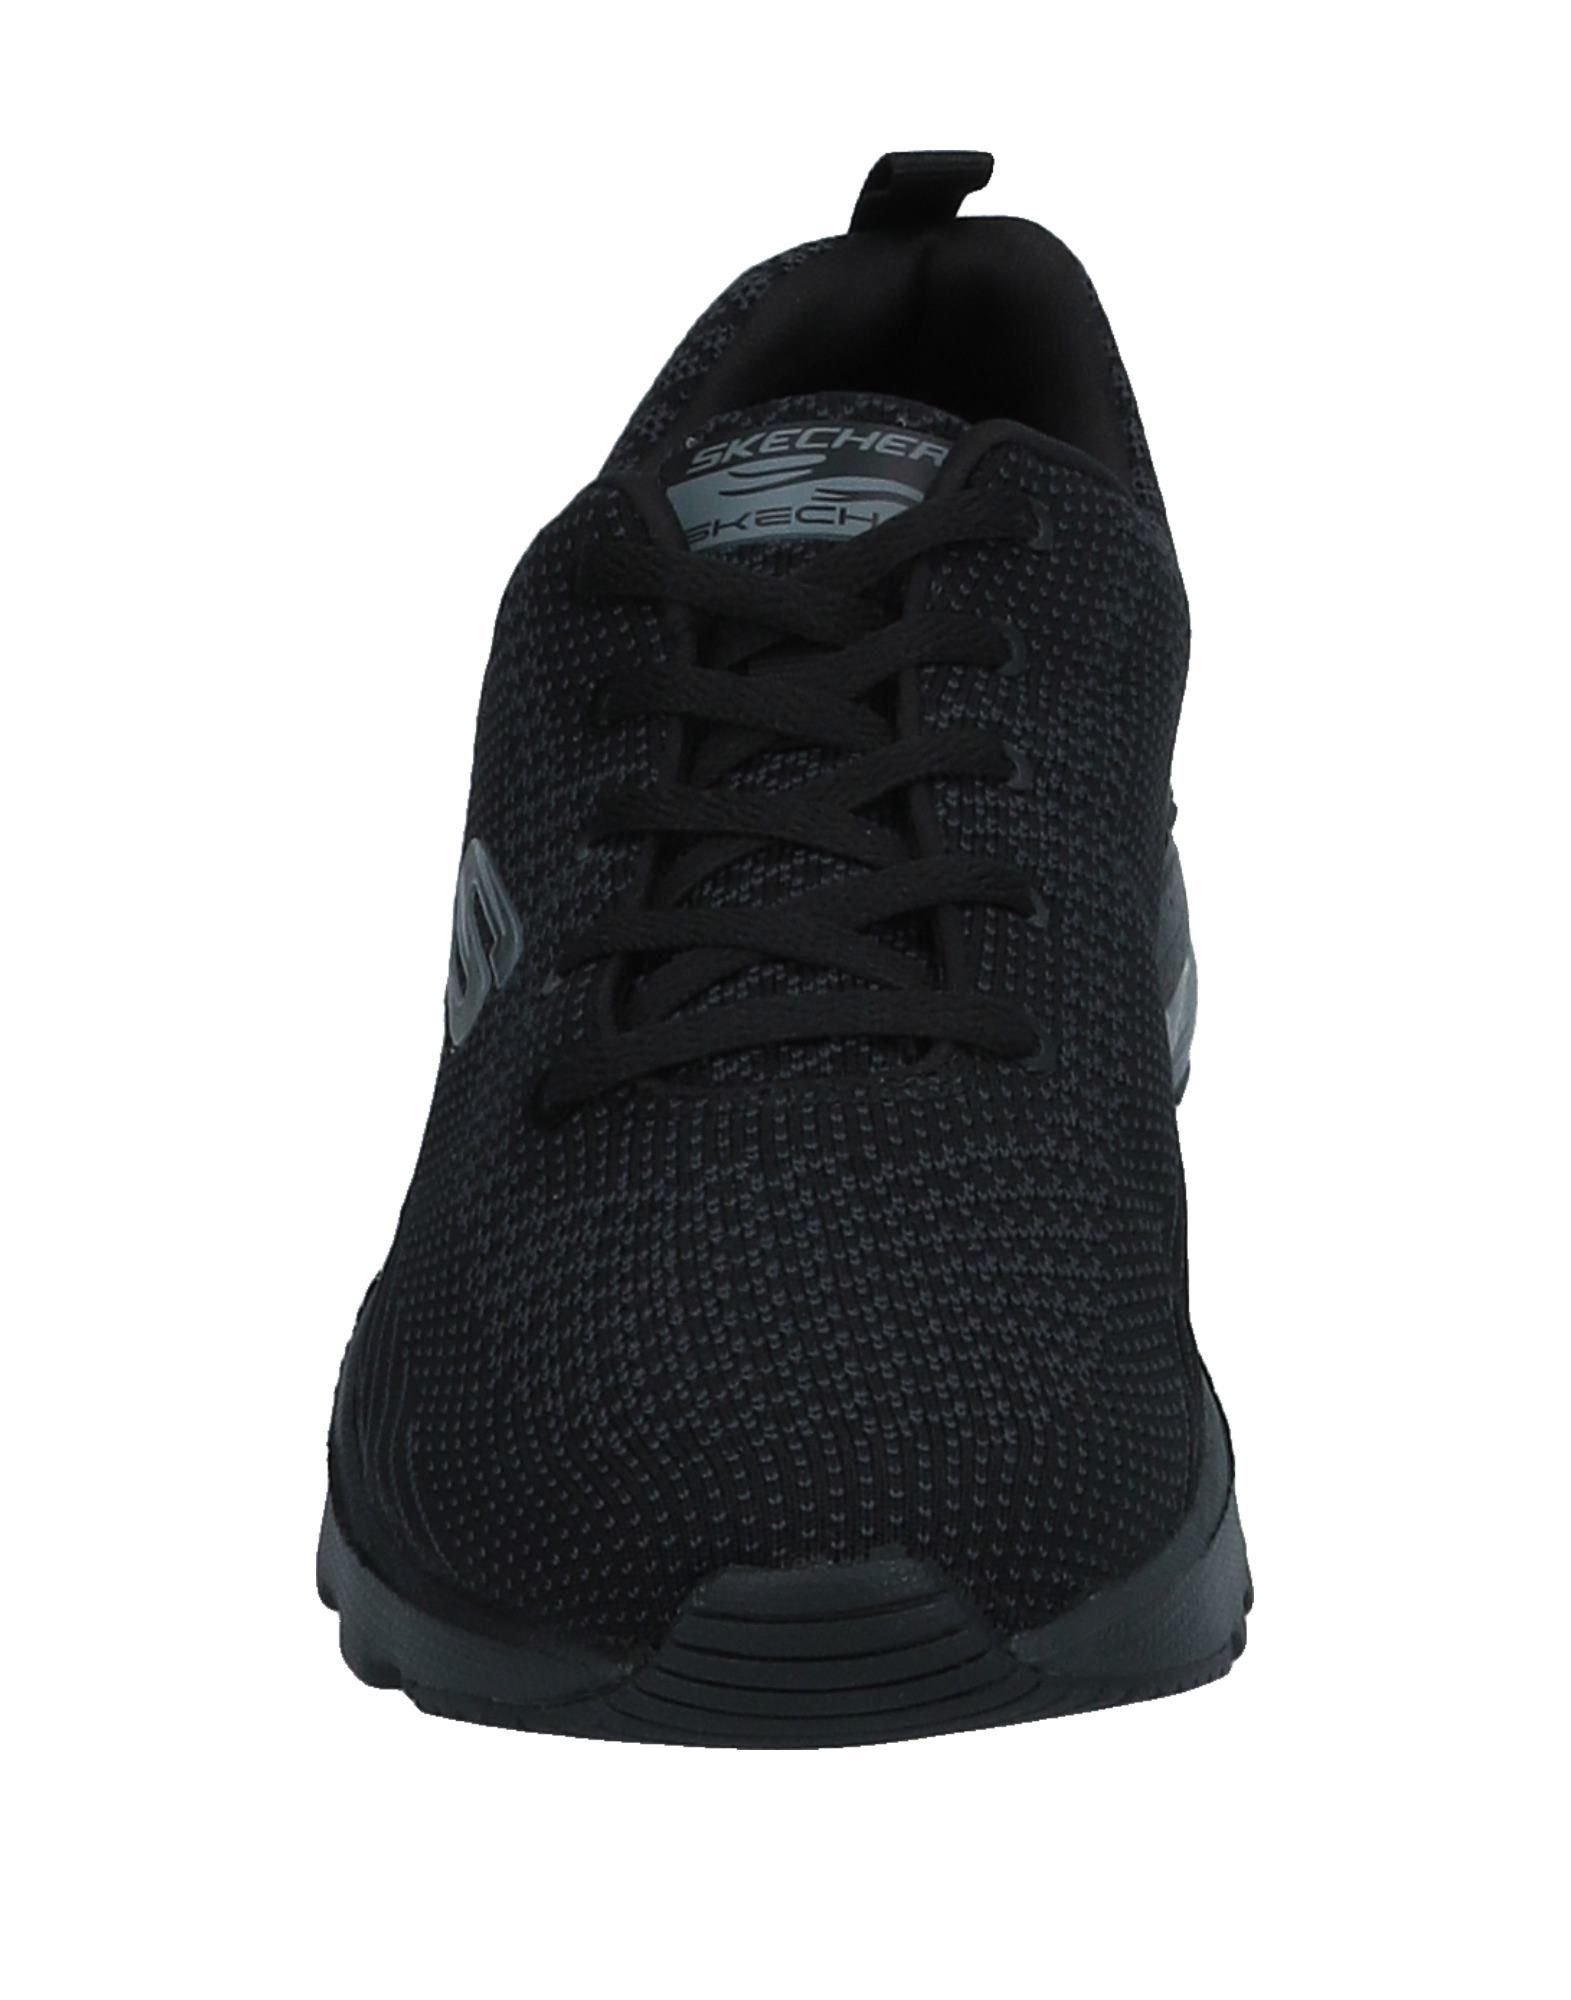 Skechers Sneakers Damen Damen Sneakers  11528982KB  4981c6